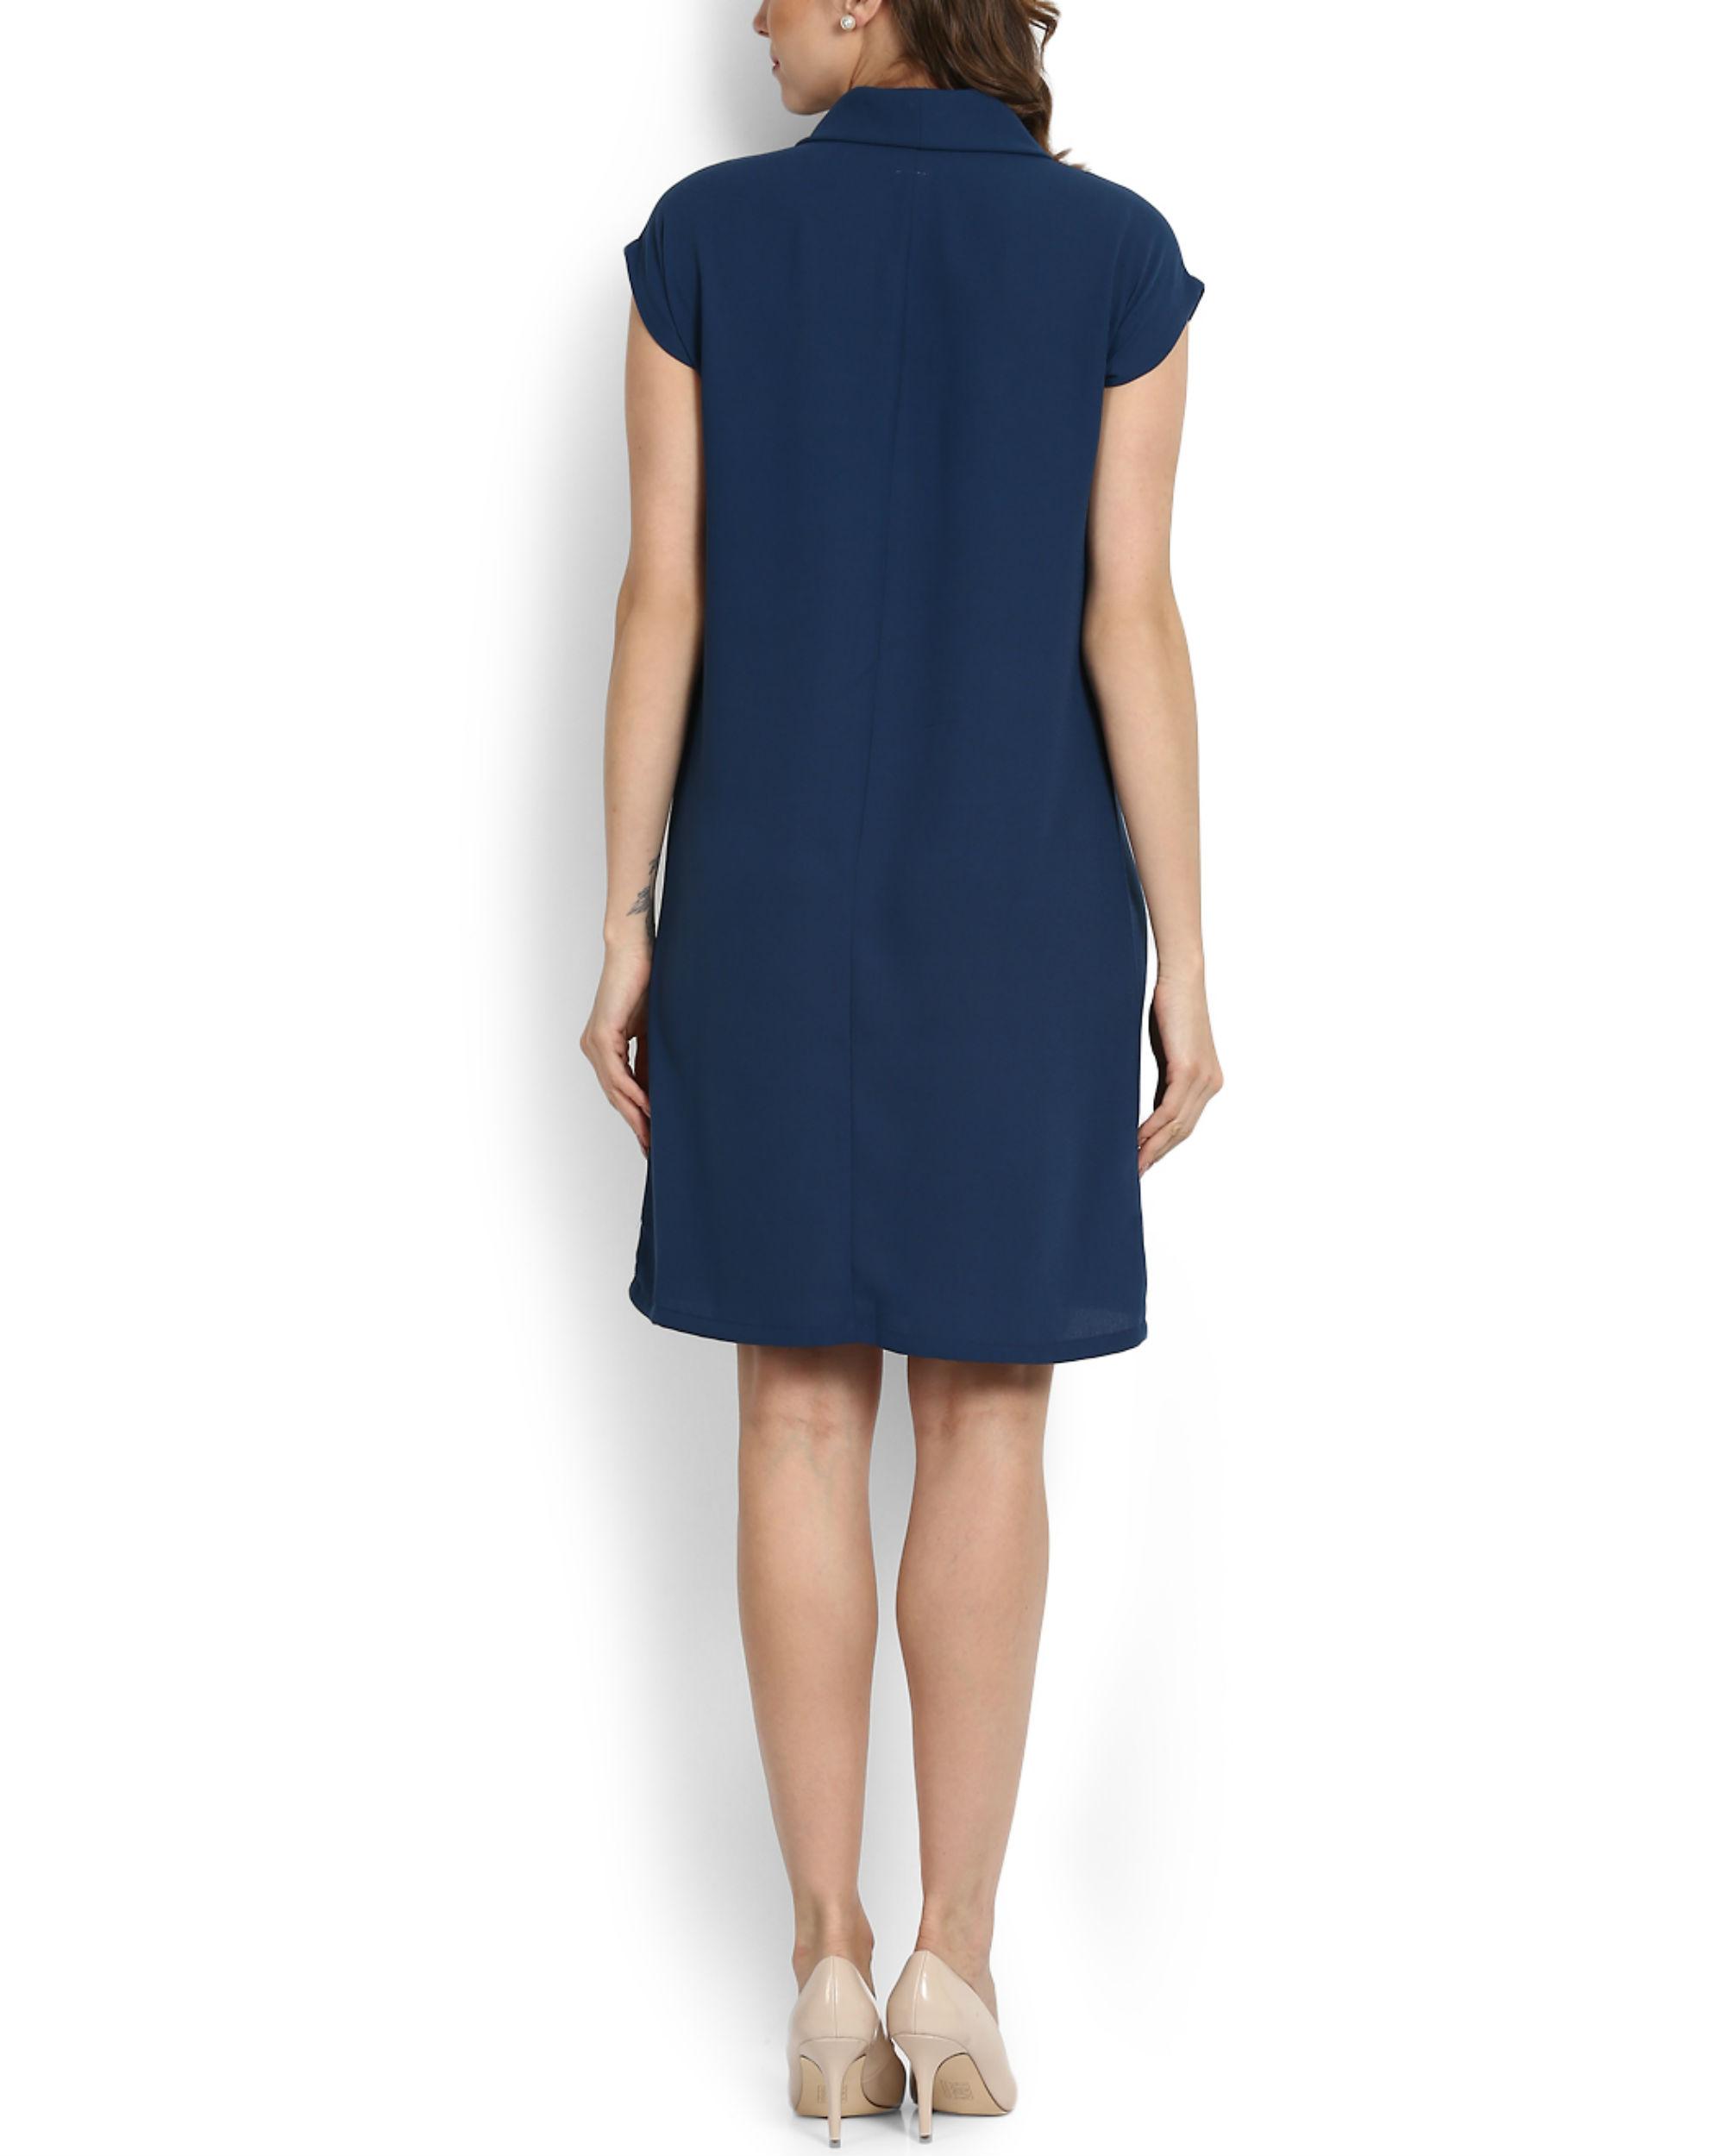 Cowl Neck Dress: Blue Cowl Neck Dress By RSVP